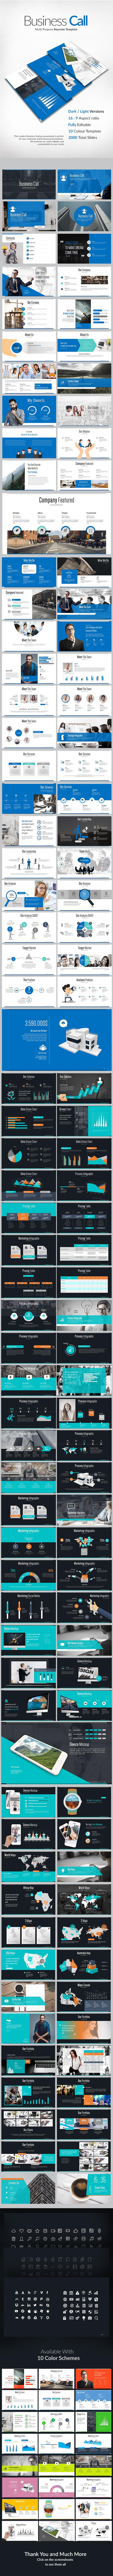 Business Call Keynote Presentation - Keynote Templates Presentation Templates